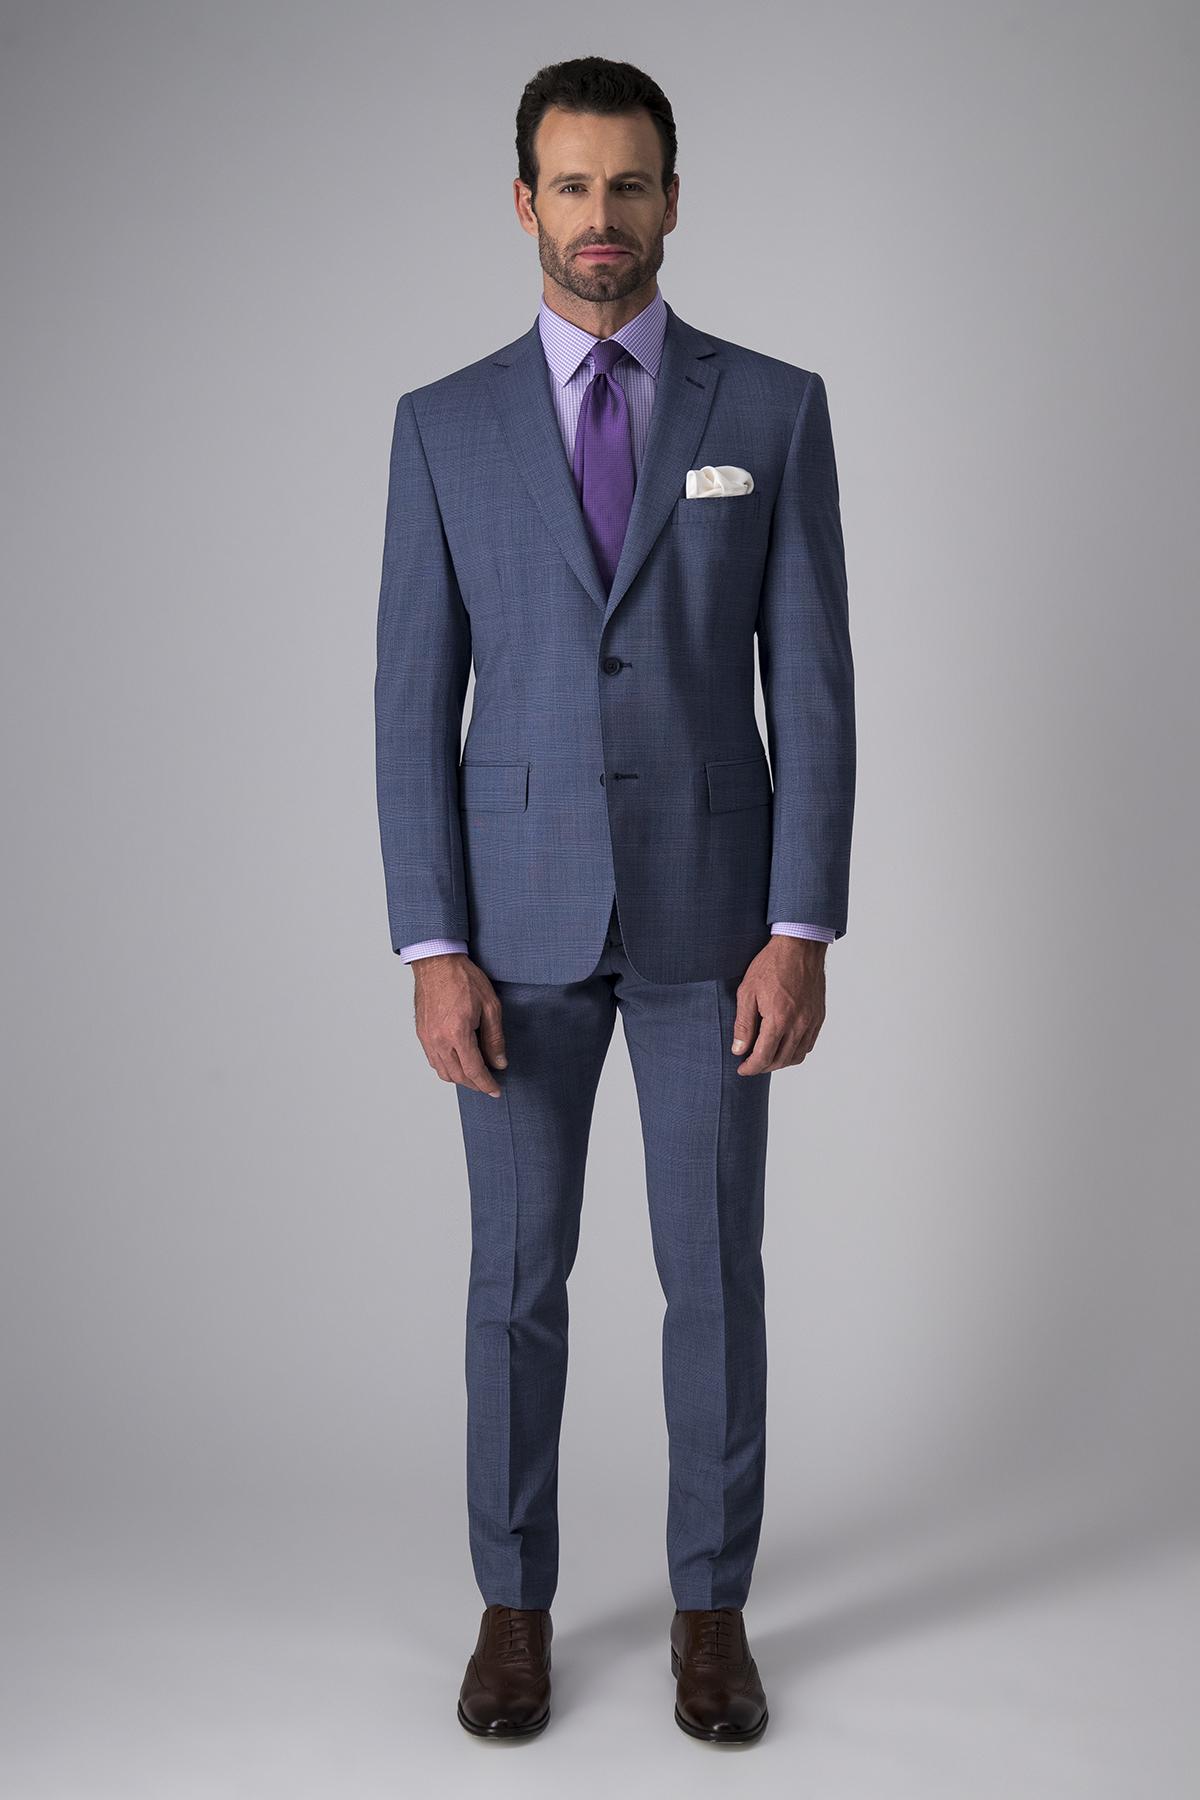 Traje Calderoni, 100% lana, tela italiana,  slim fit, gales azul,